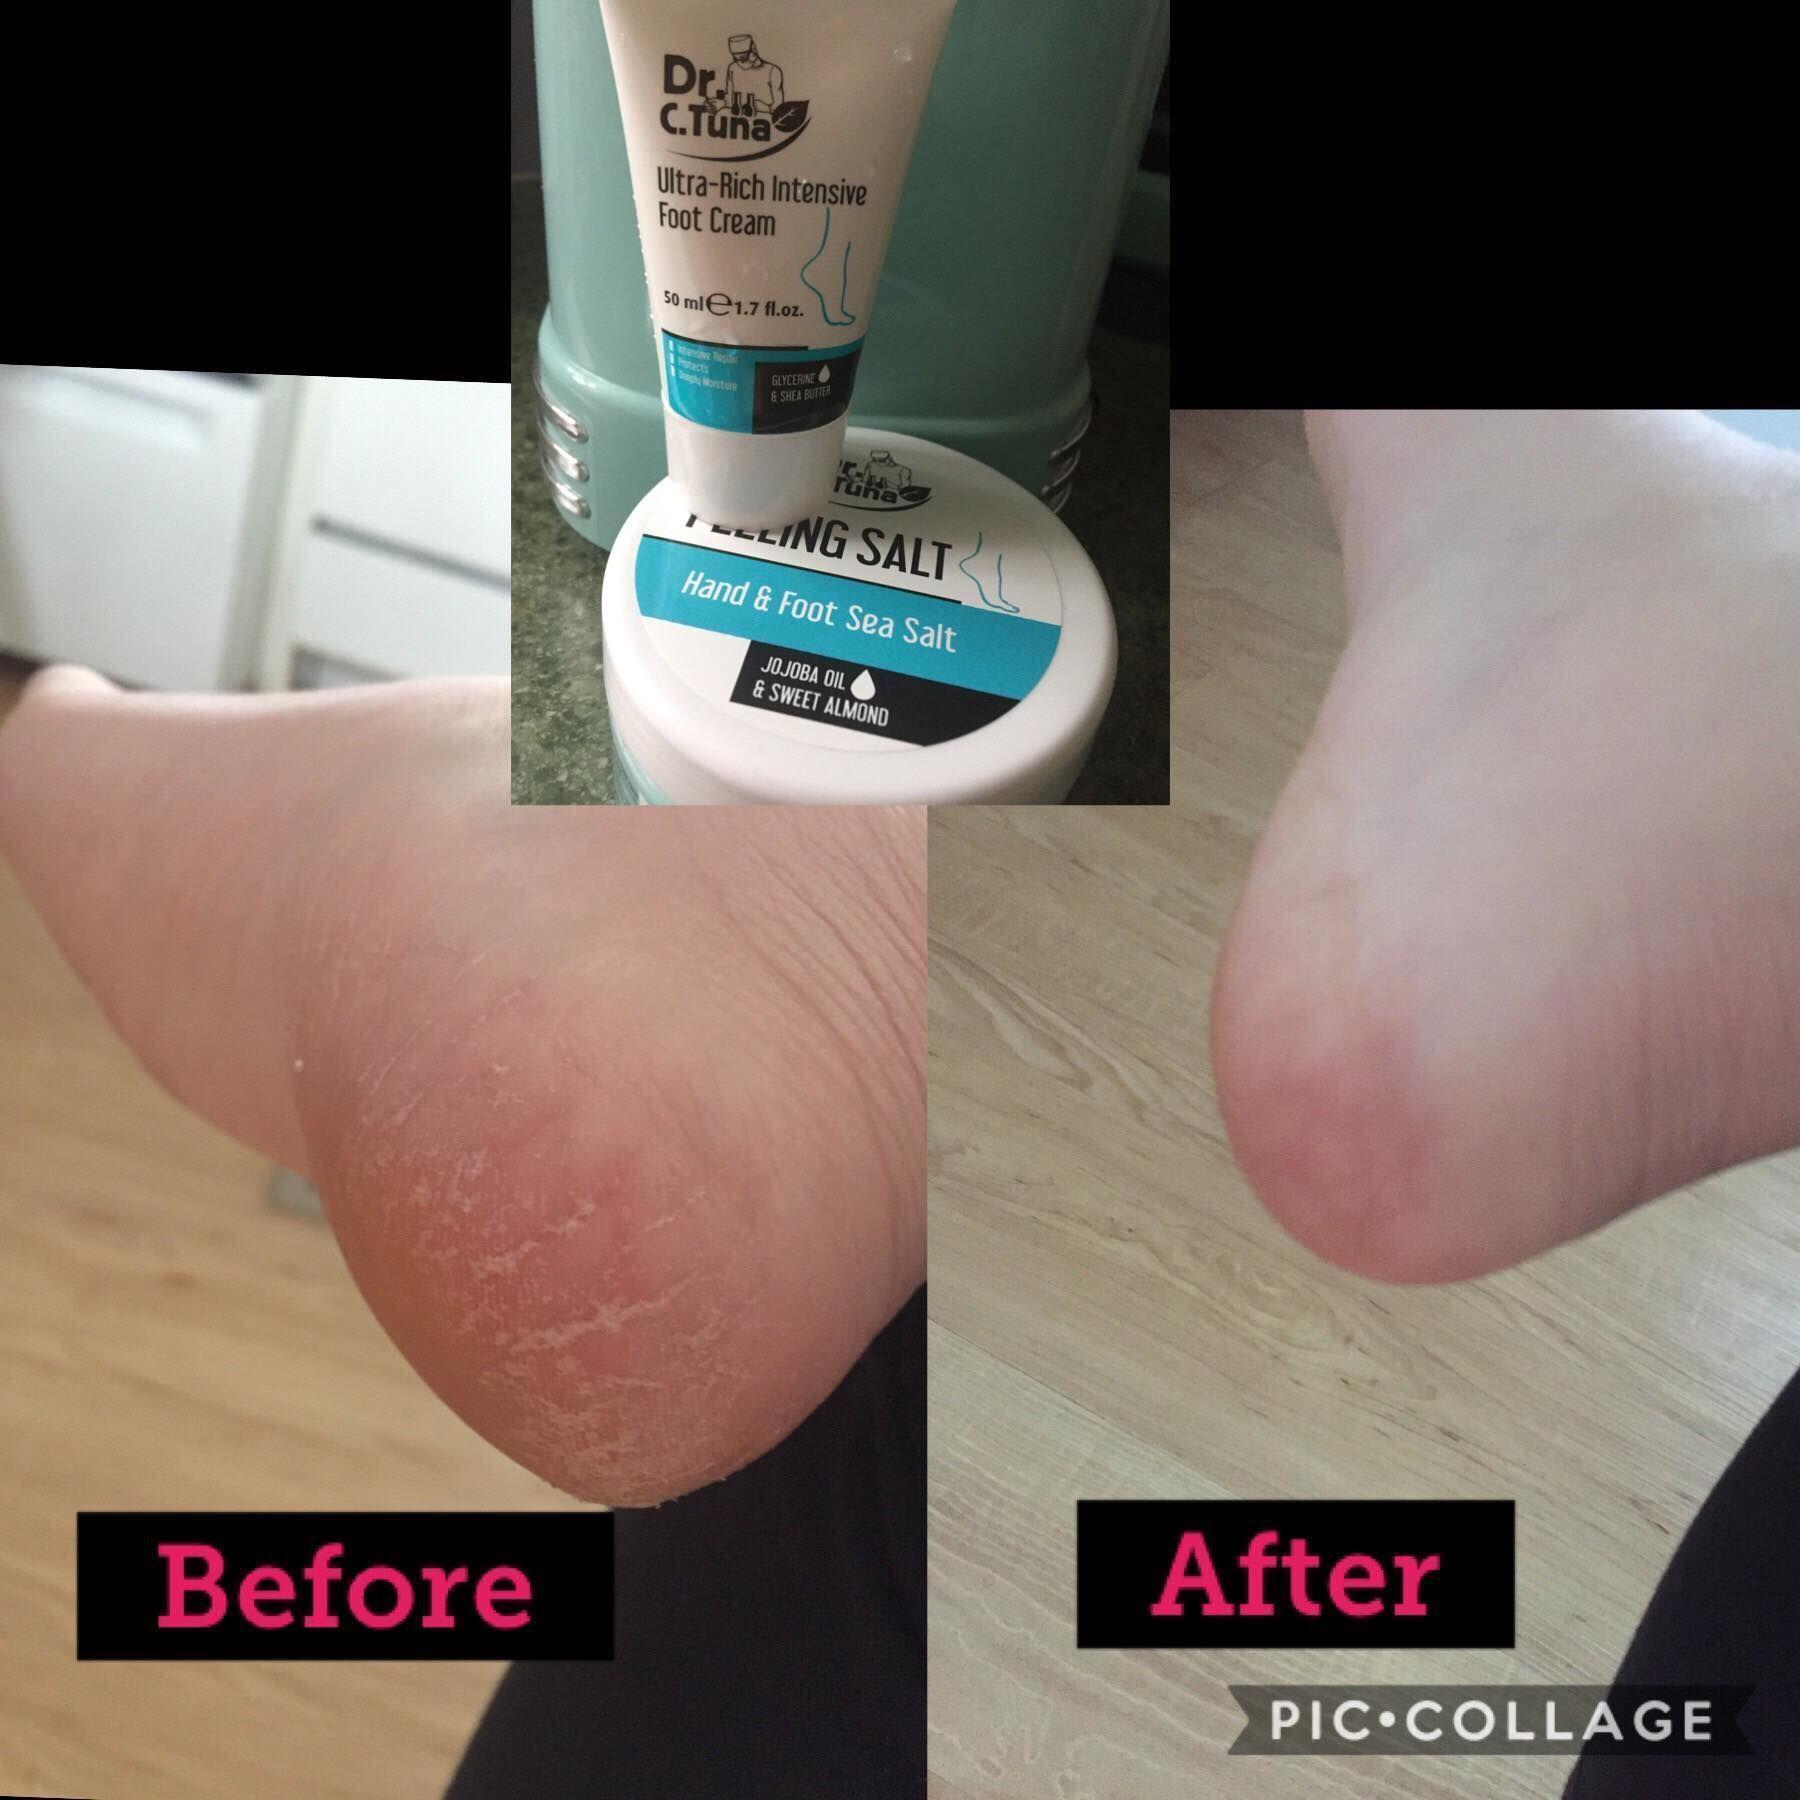 Farmasi Peeling Sea Salt For #Feet and